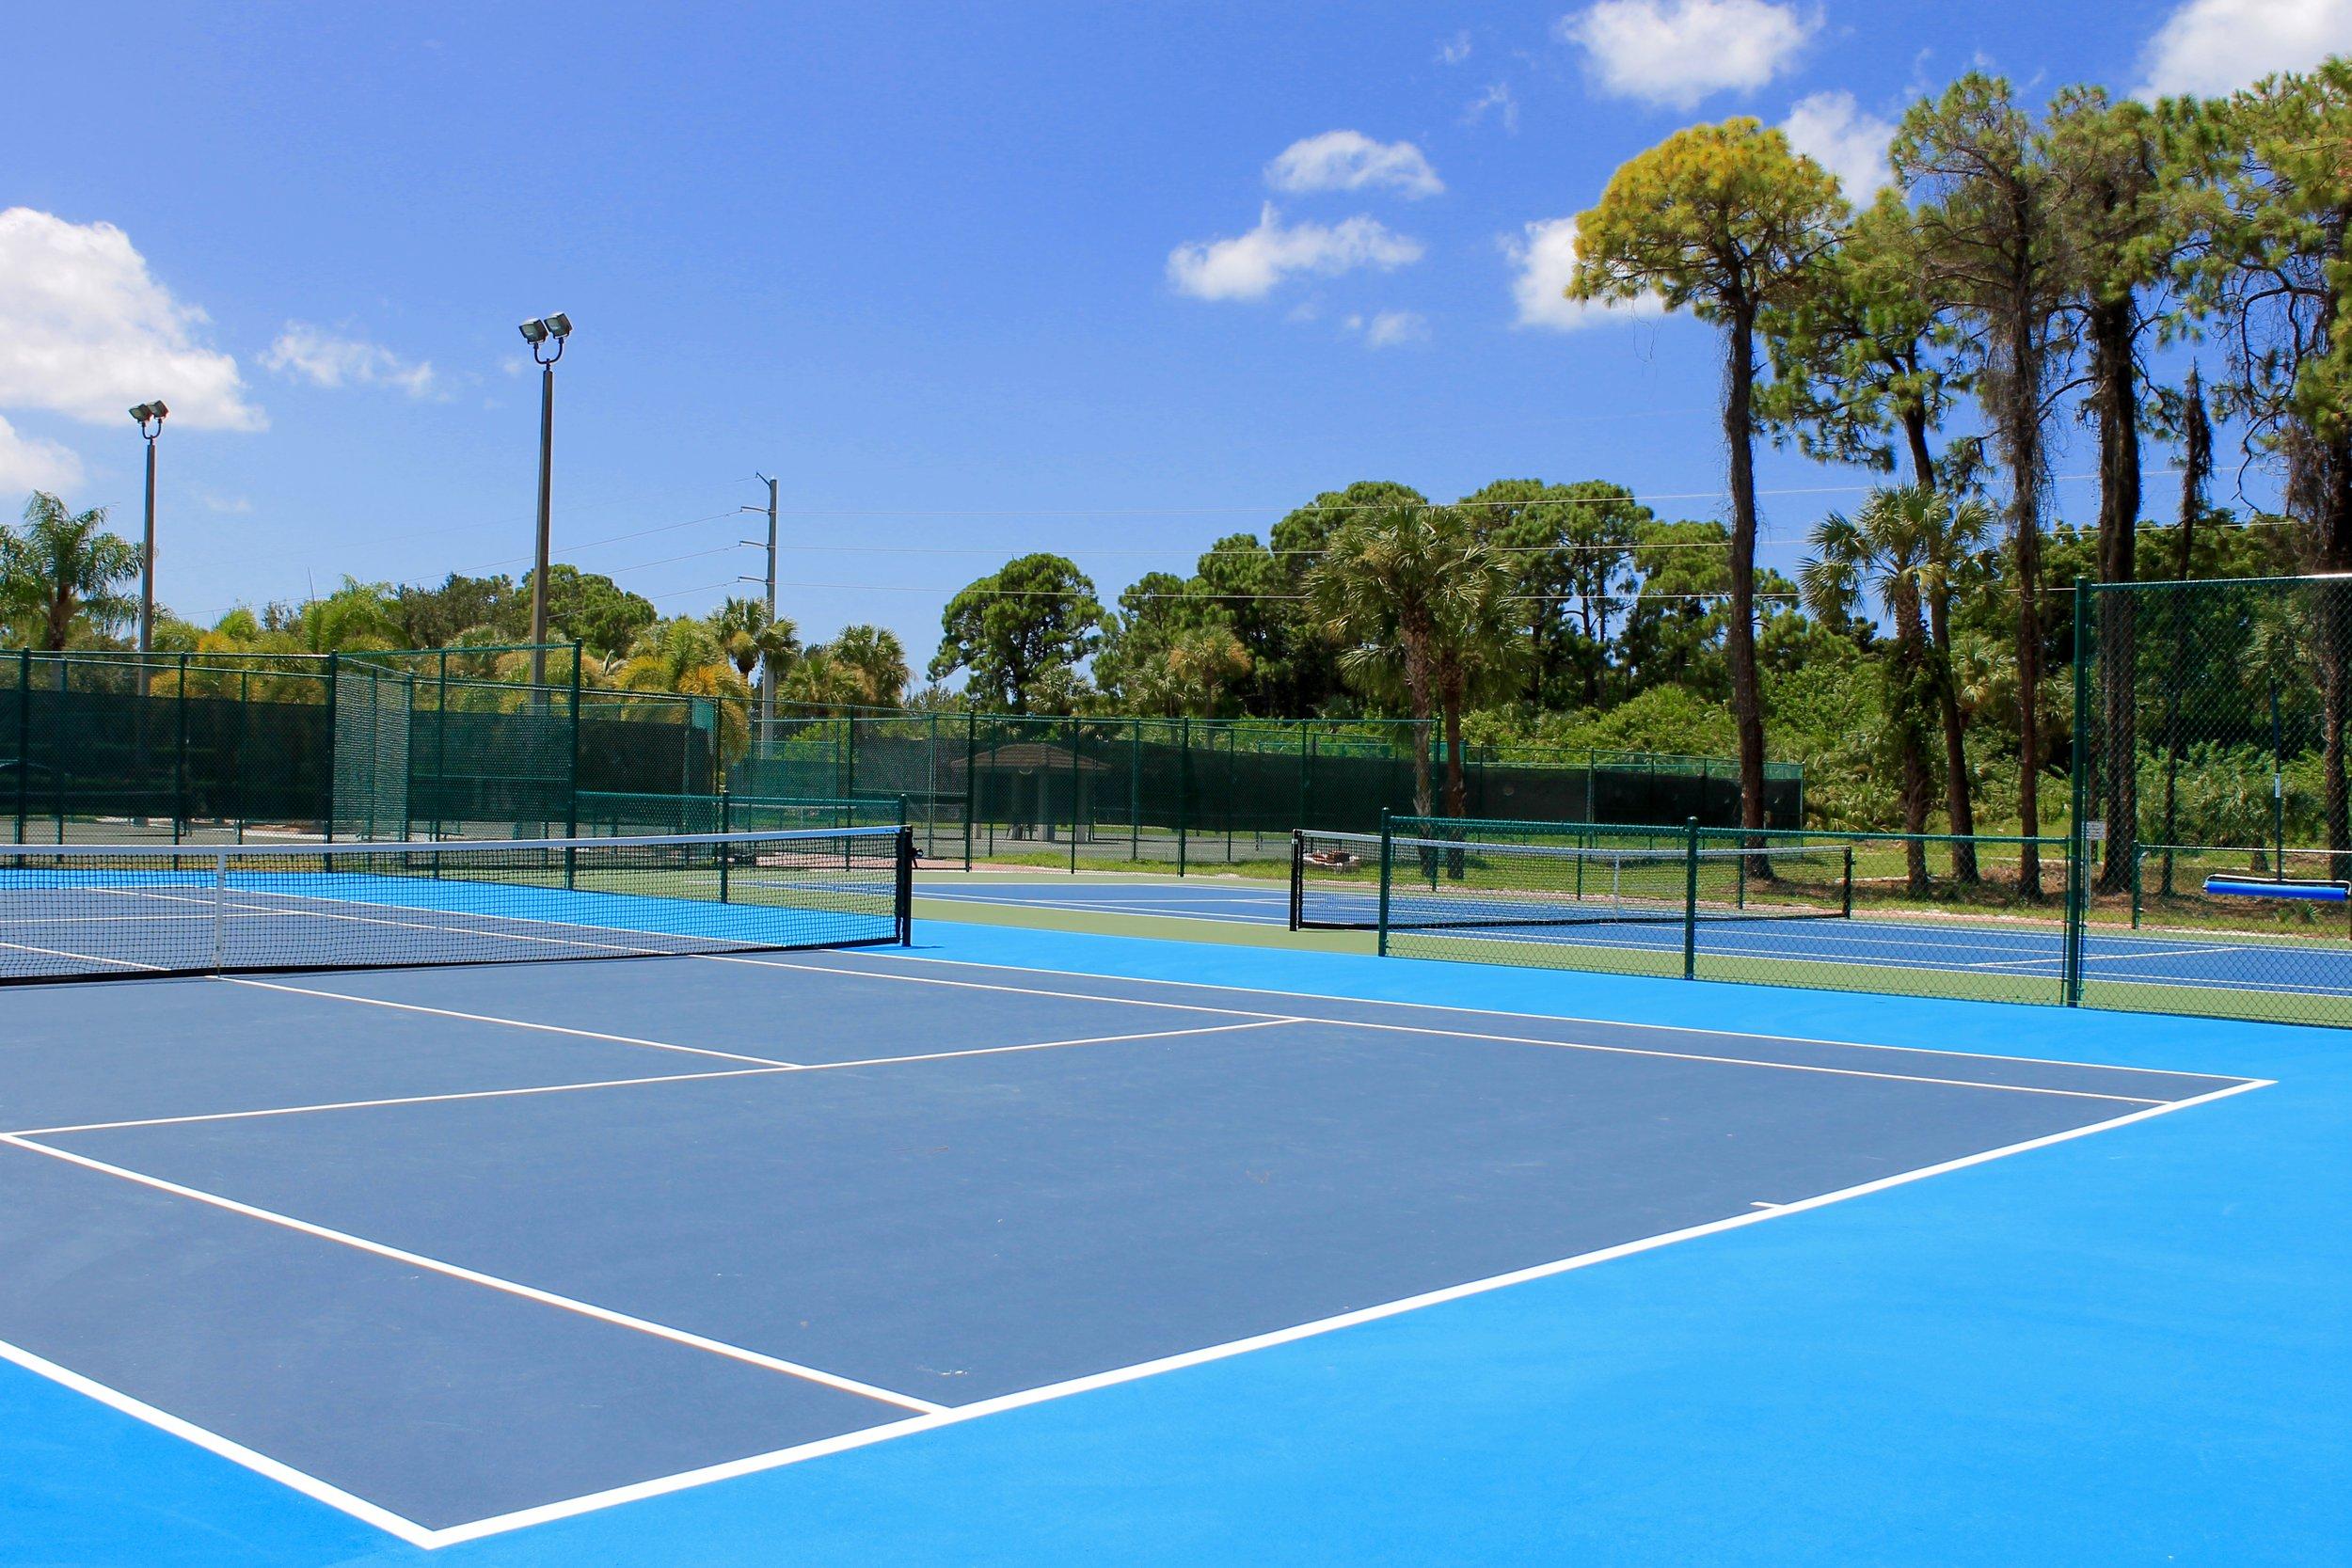 gomez-tennis-academy-naples-florida-hard-courts.jpg